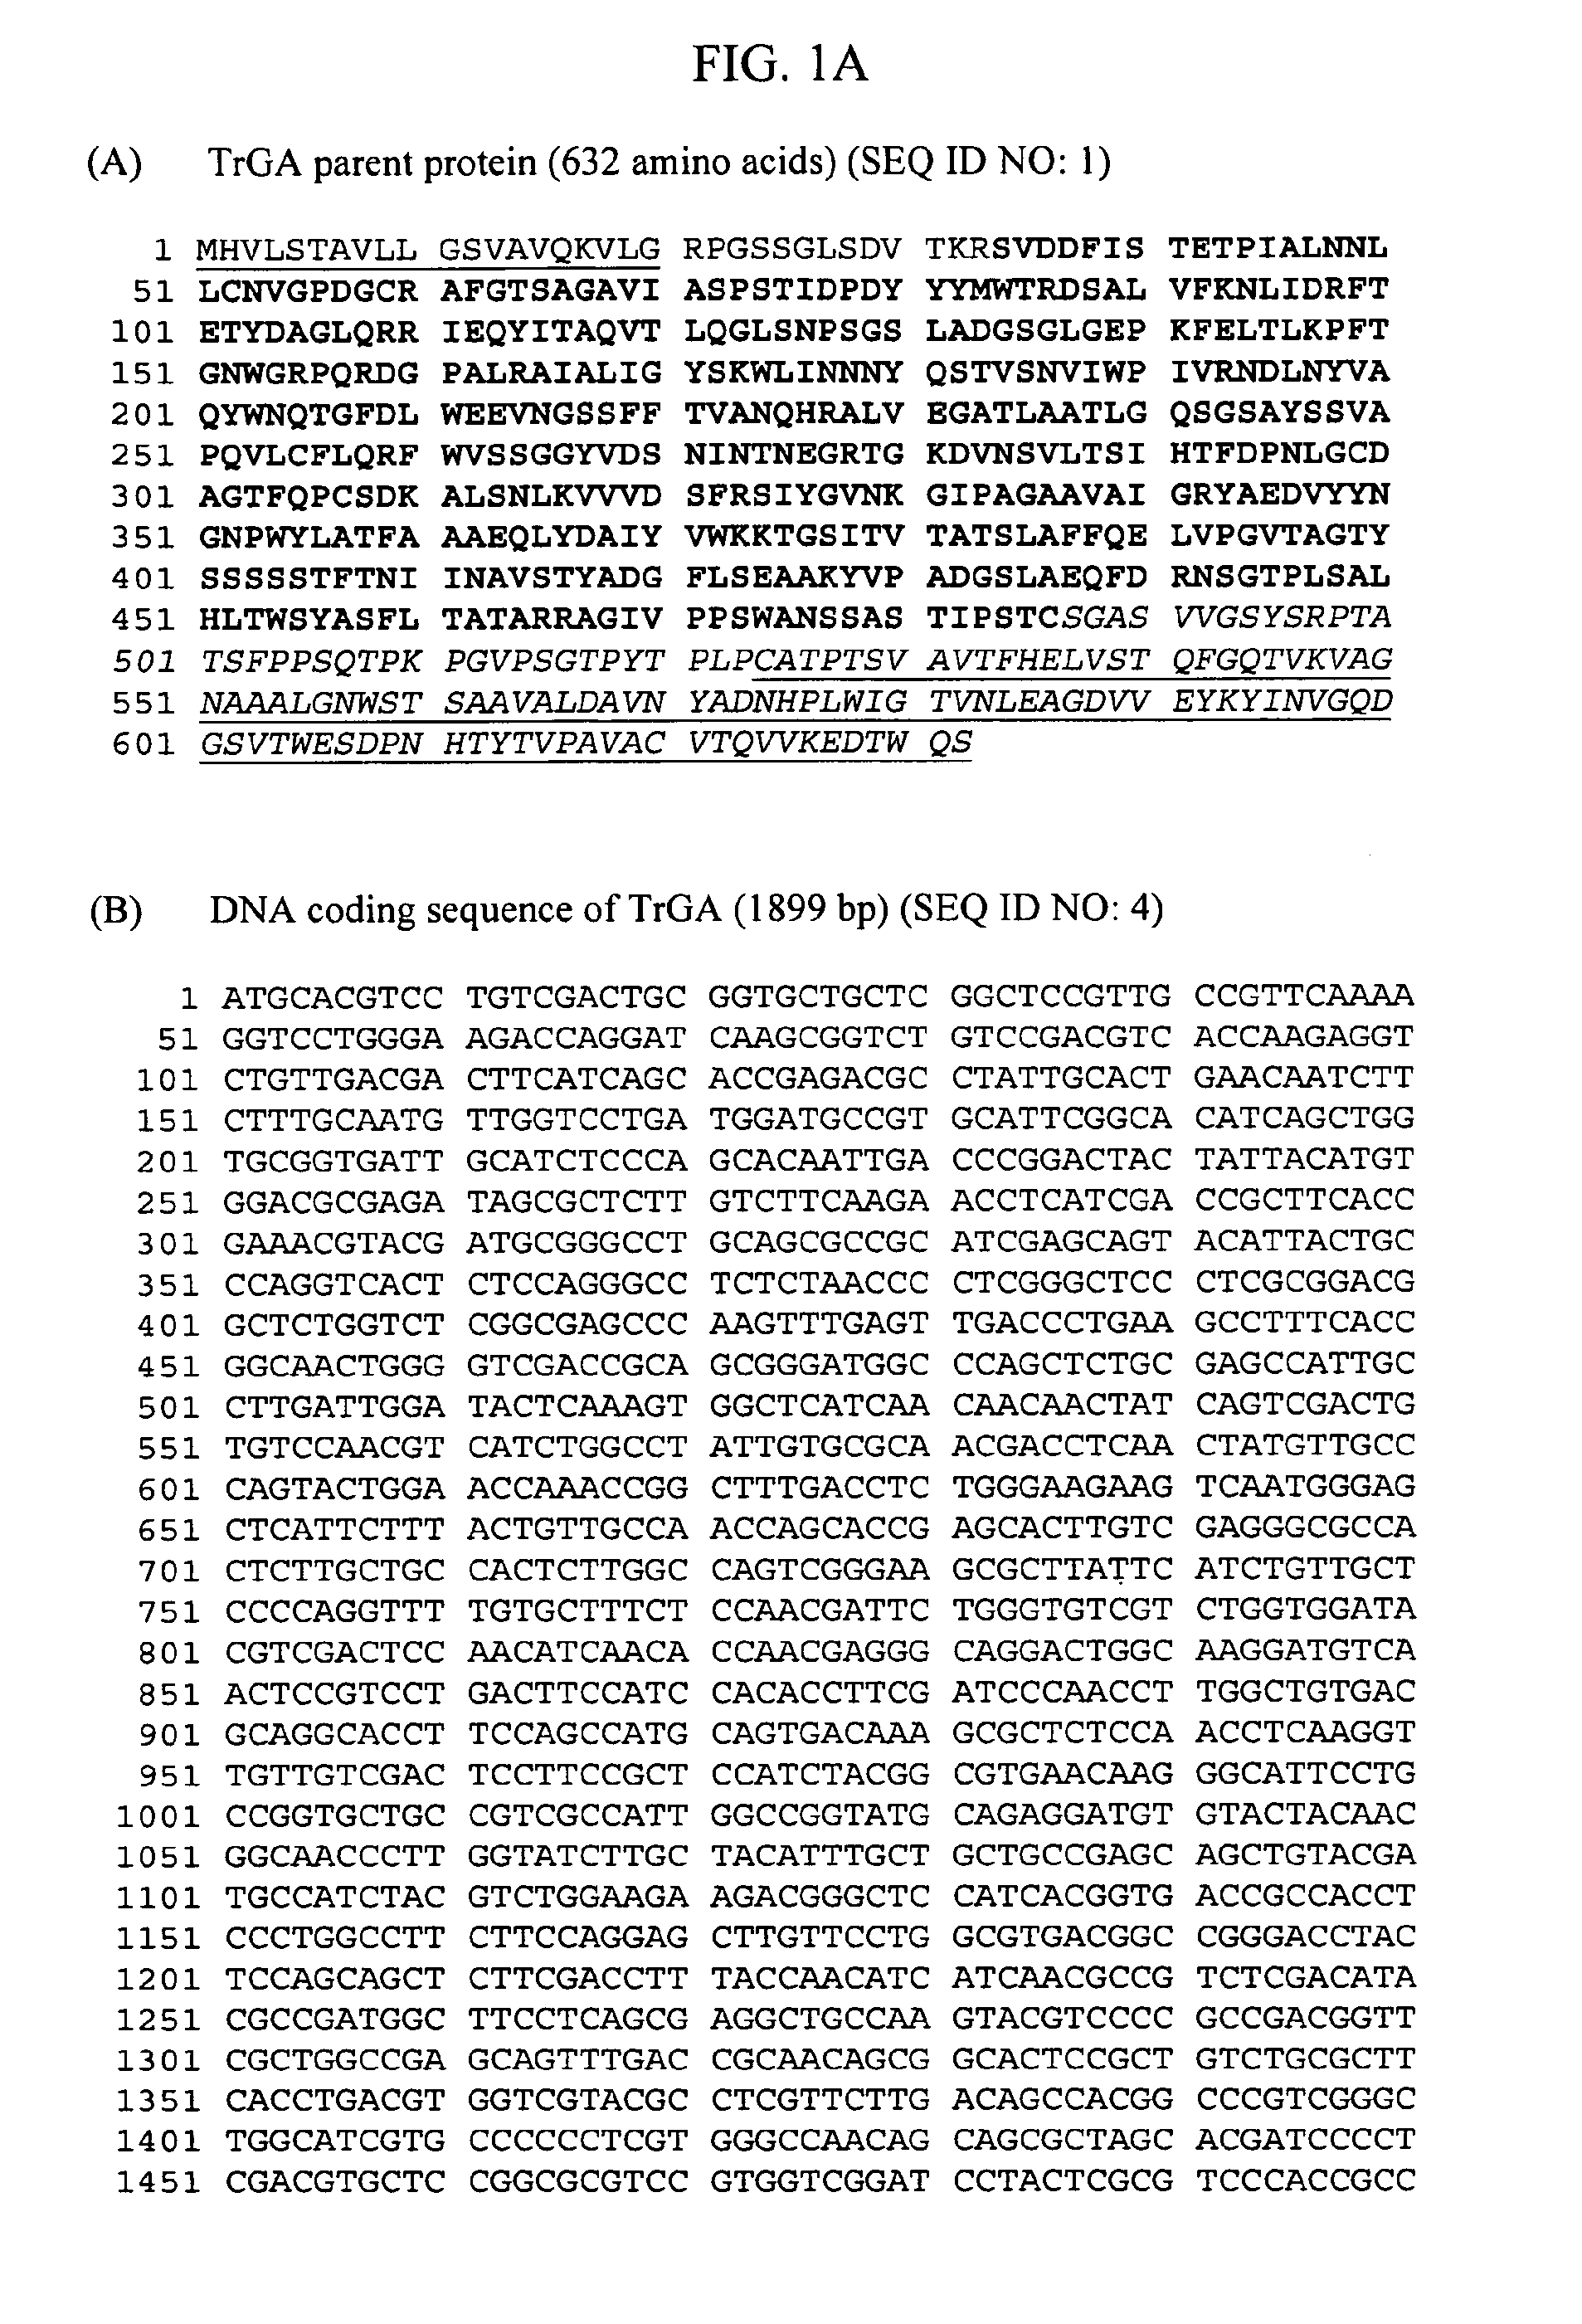 US8551755B2 - Glucoamylase variants - Google Patents